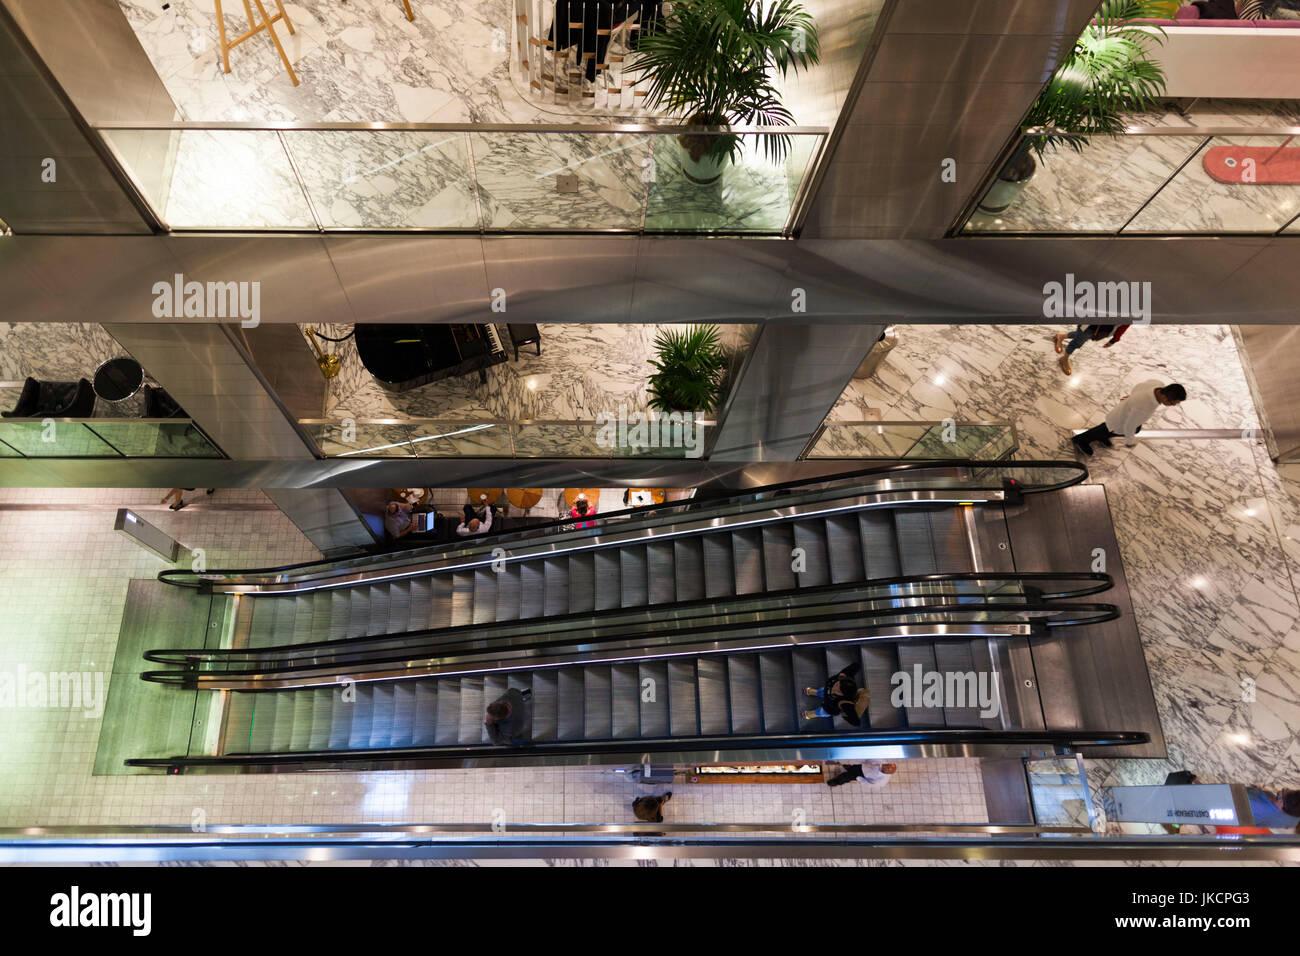 Australia, New South Wales, NSW, Sydney, The Westfield, shopping center, escalators Stock Photo